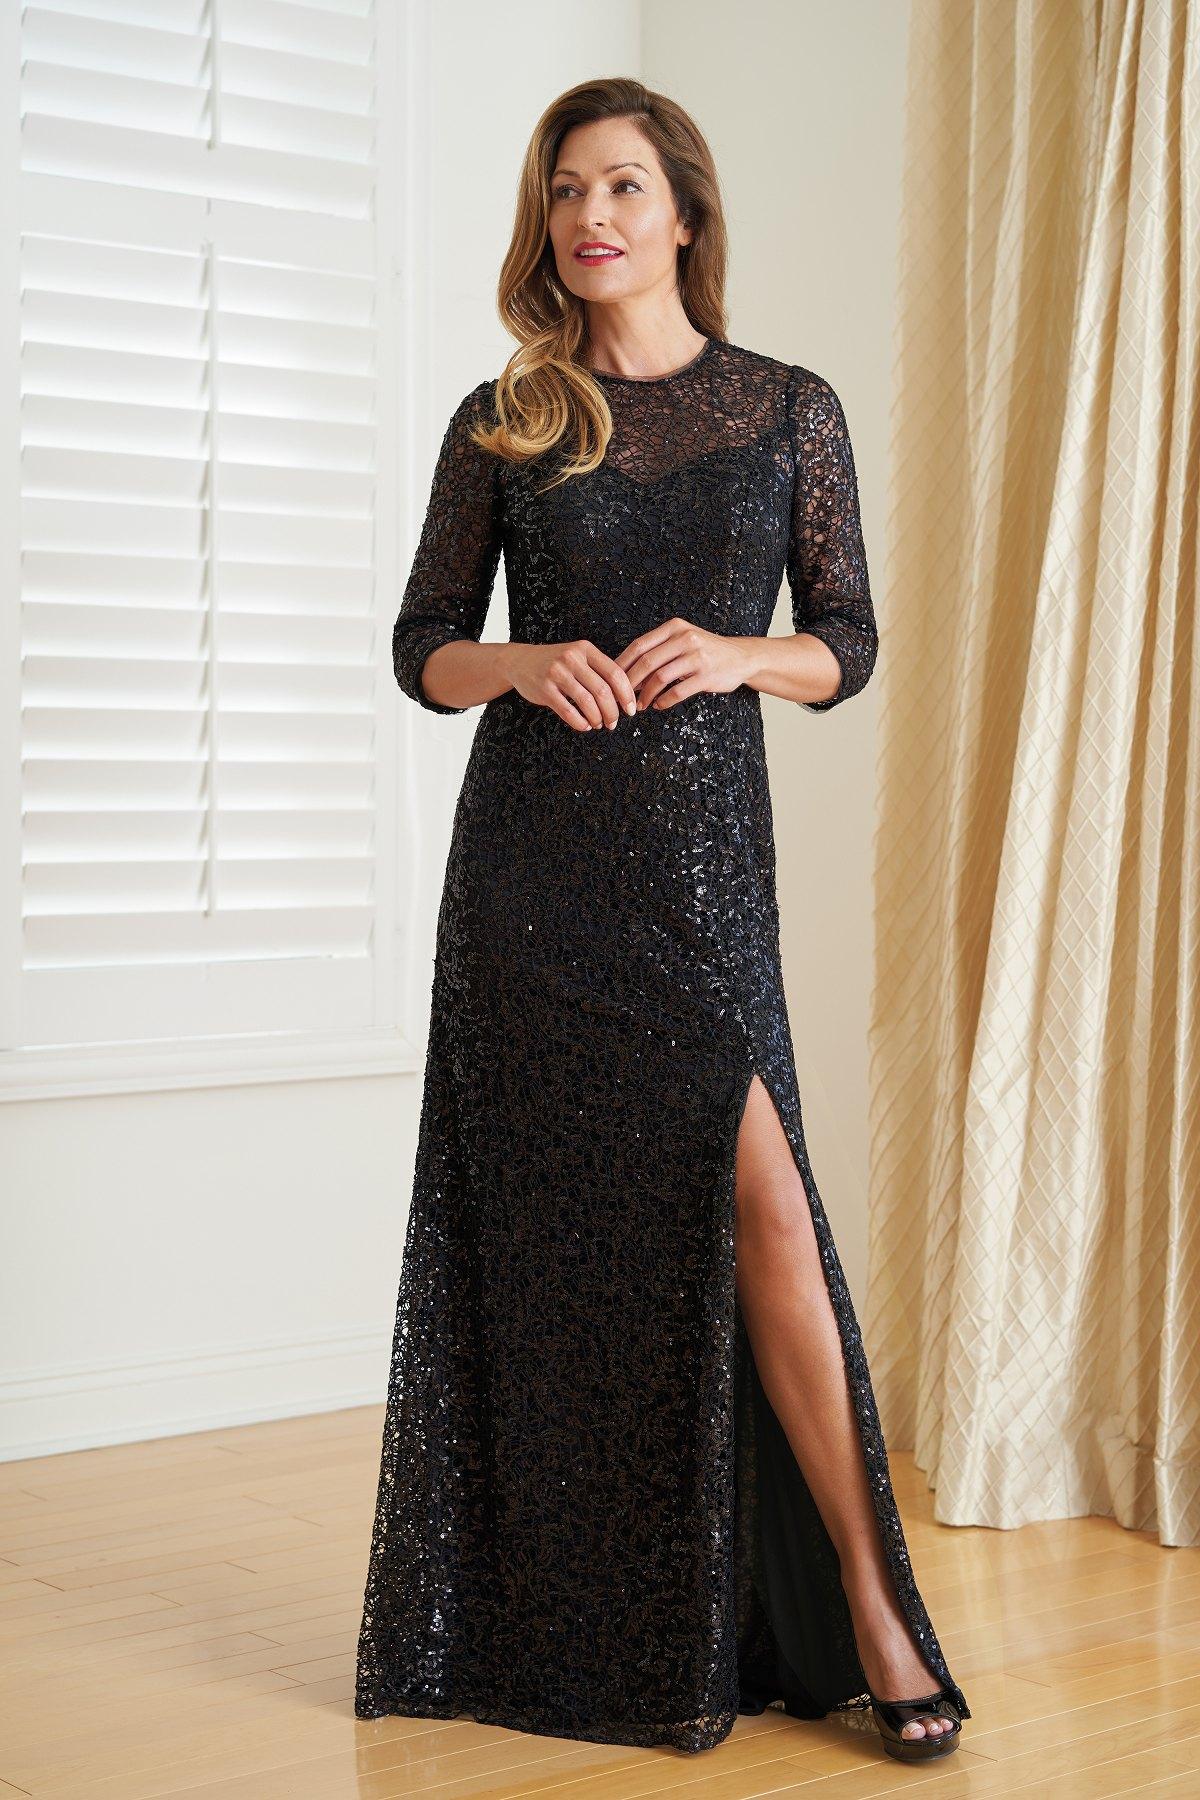 bd1c7dba9995 K218016U Grace Sequin Lace MOB Dress with Jewel Neckline